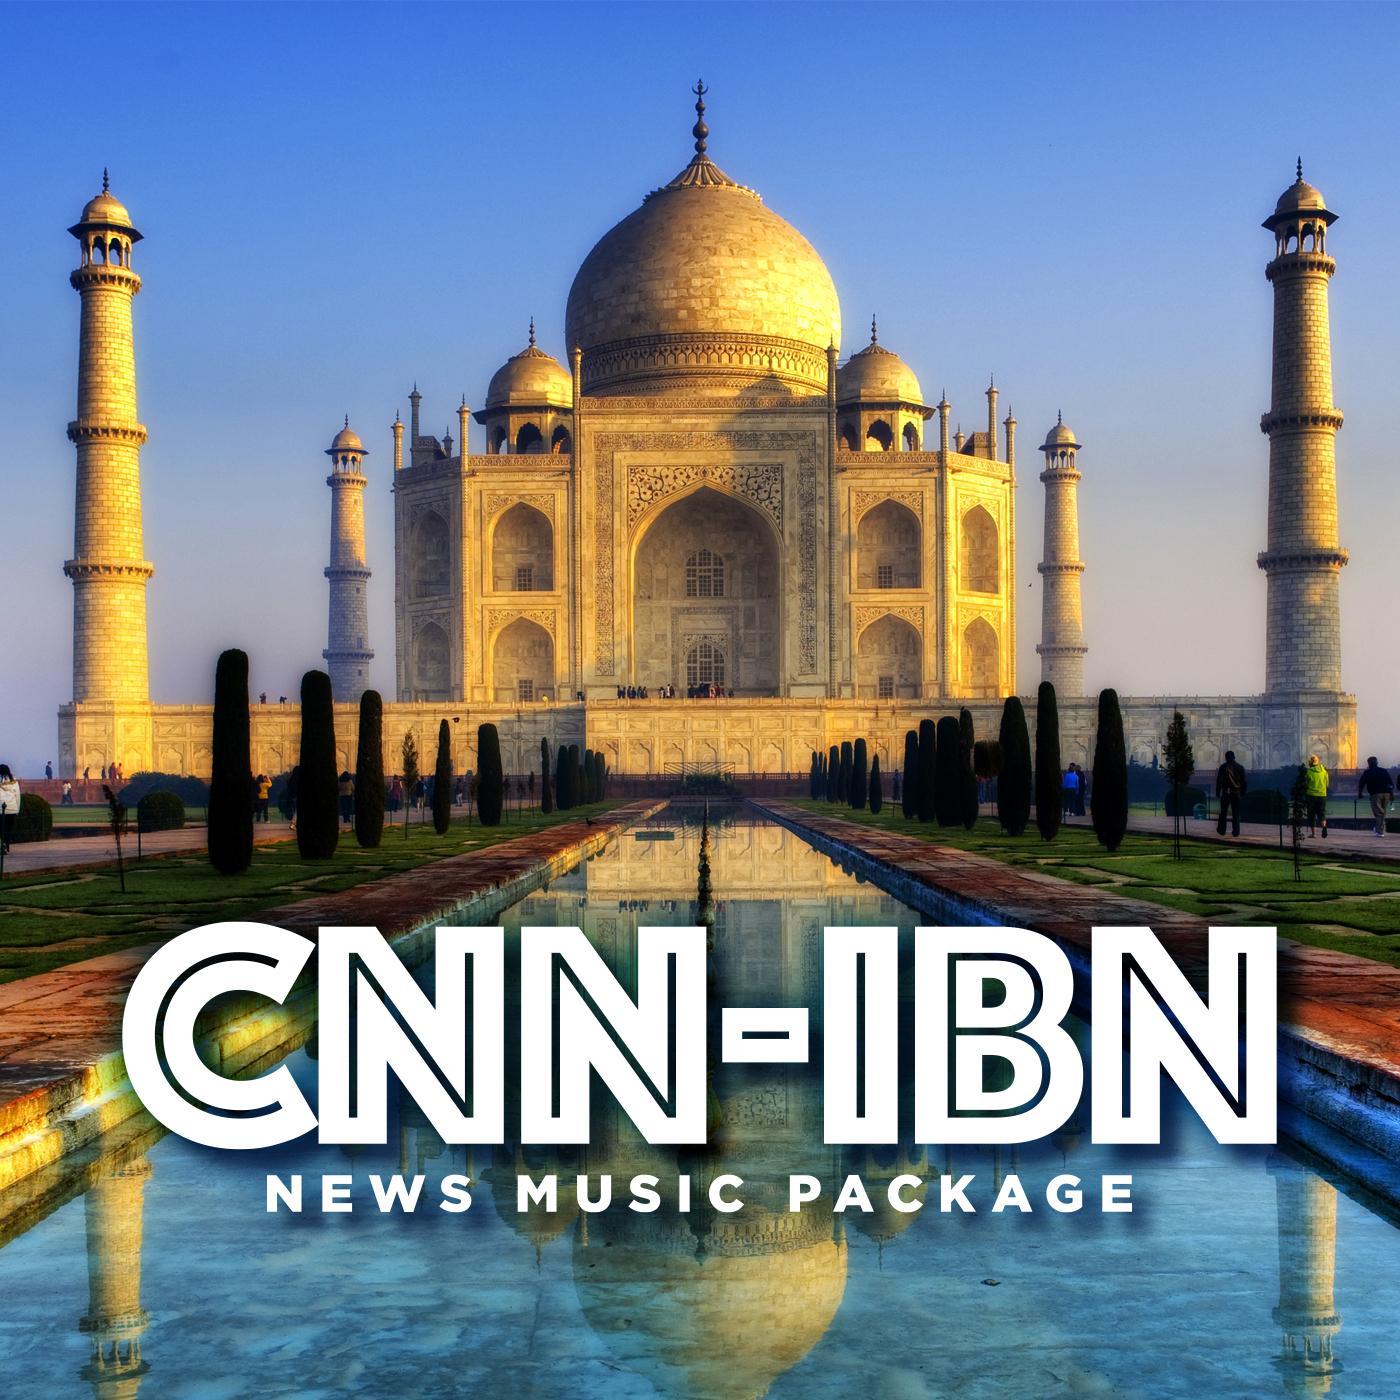 CNN-IBN News Music Package